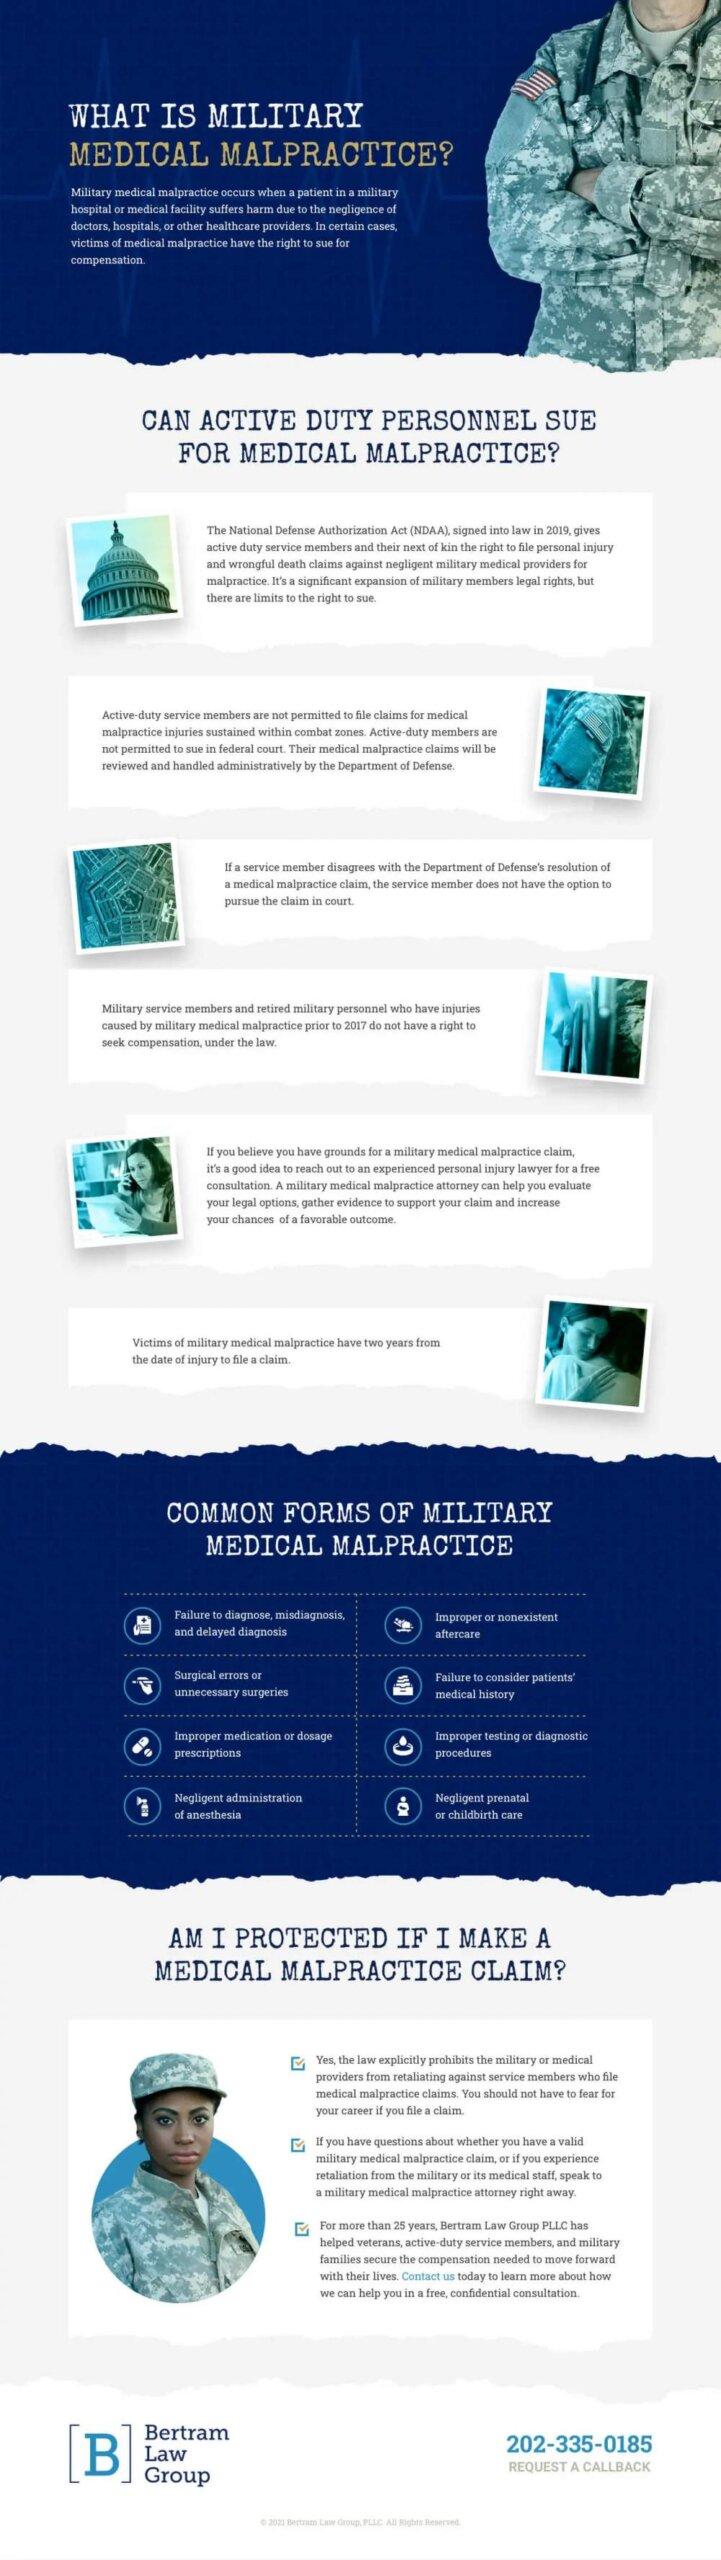 military-medical-malpractice